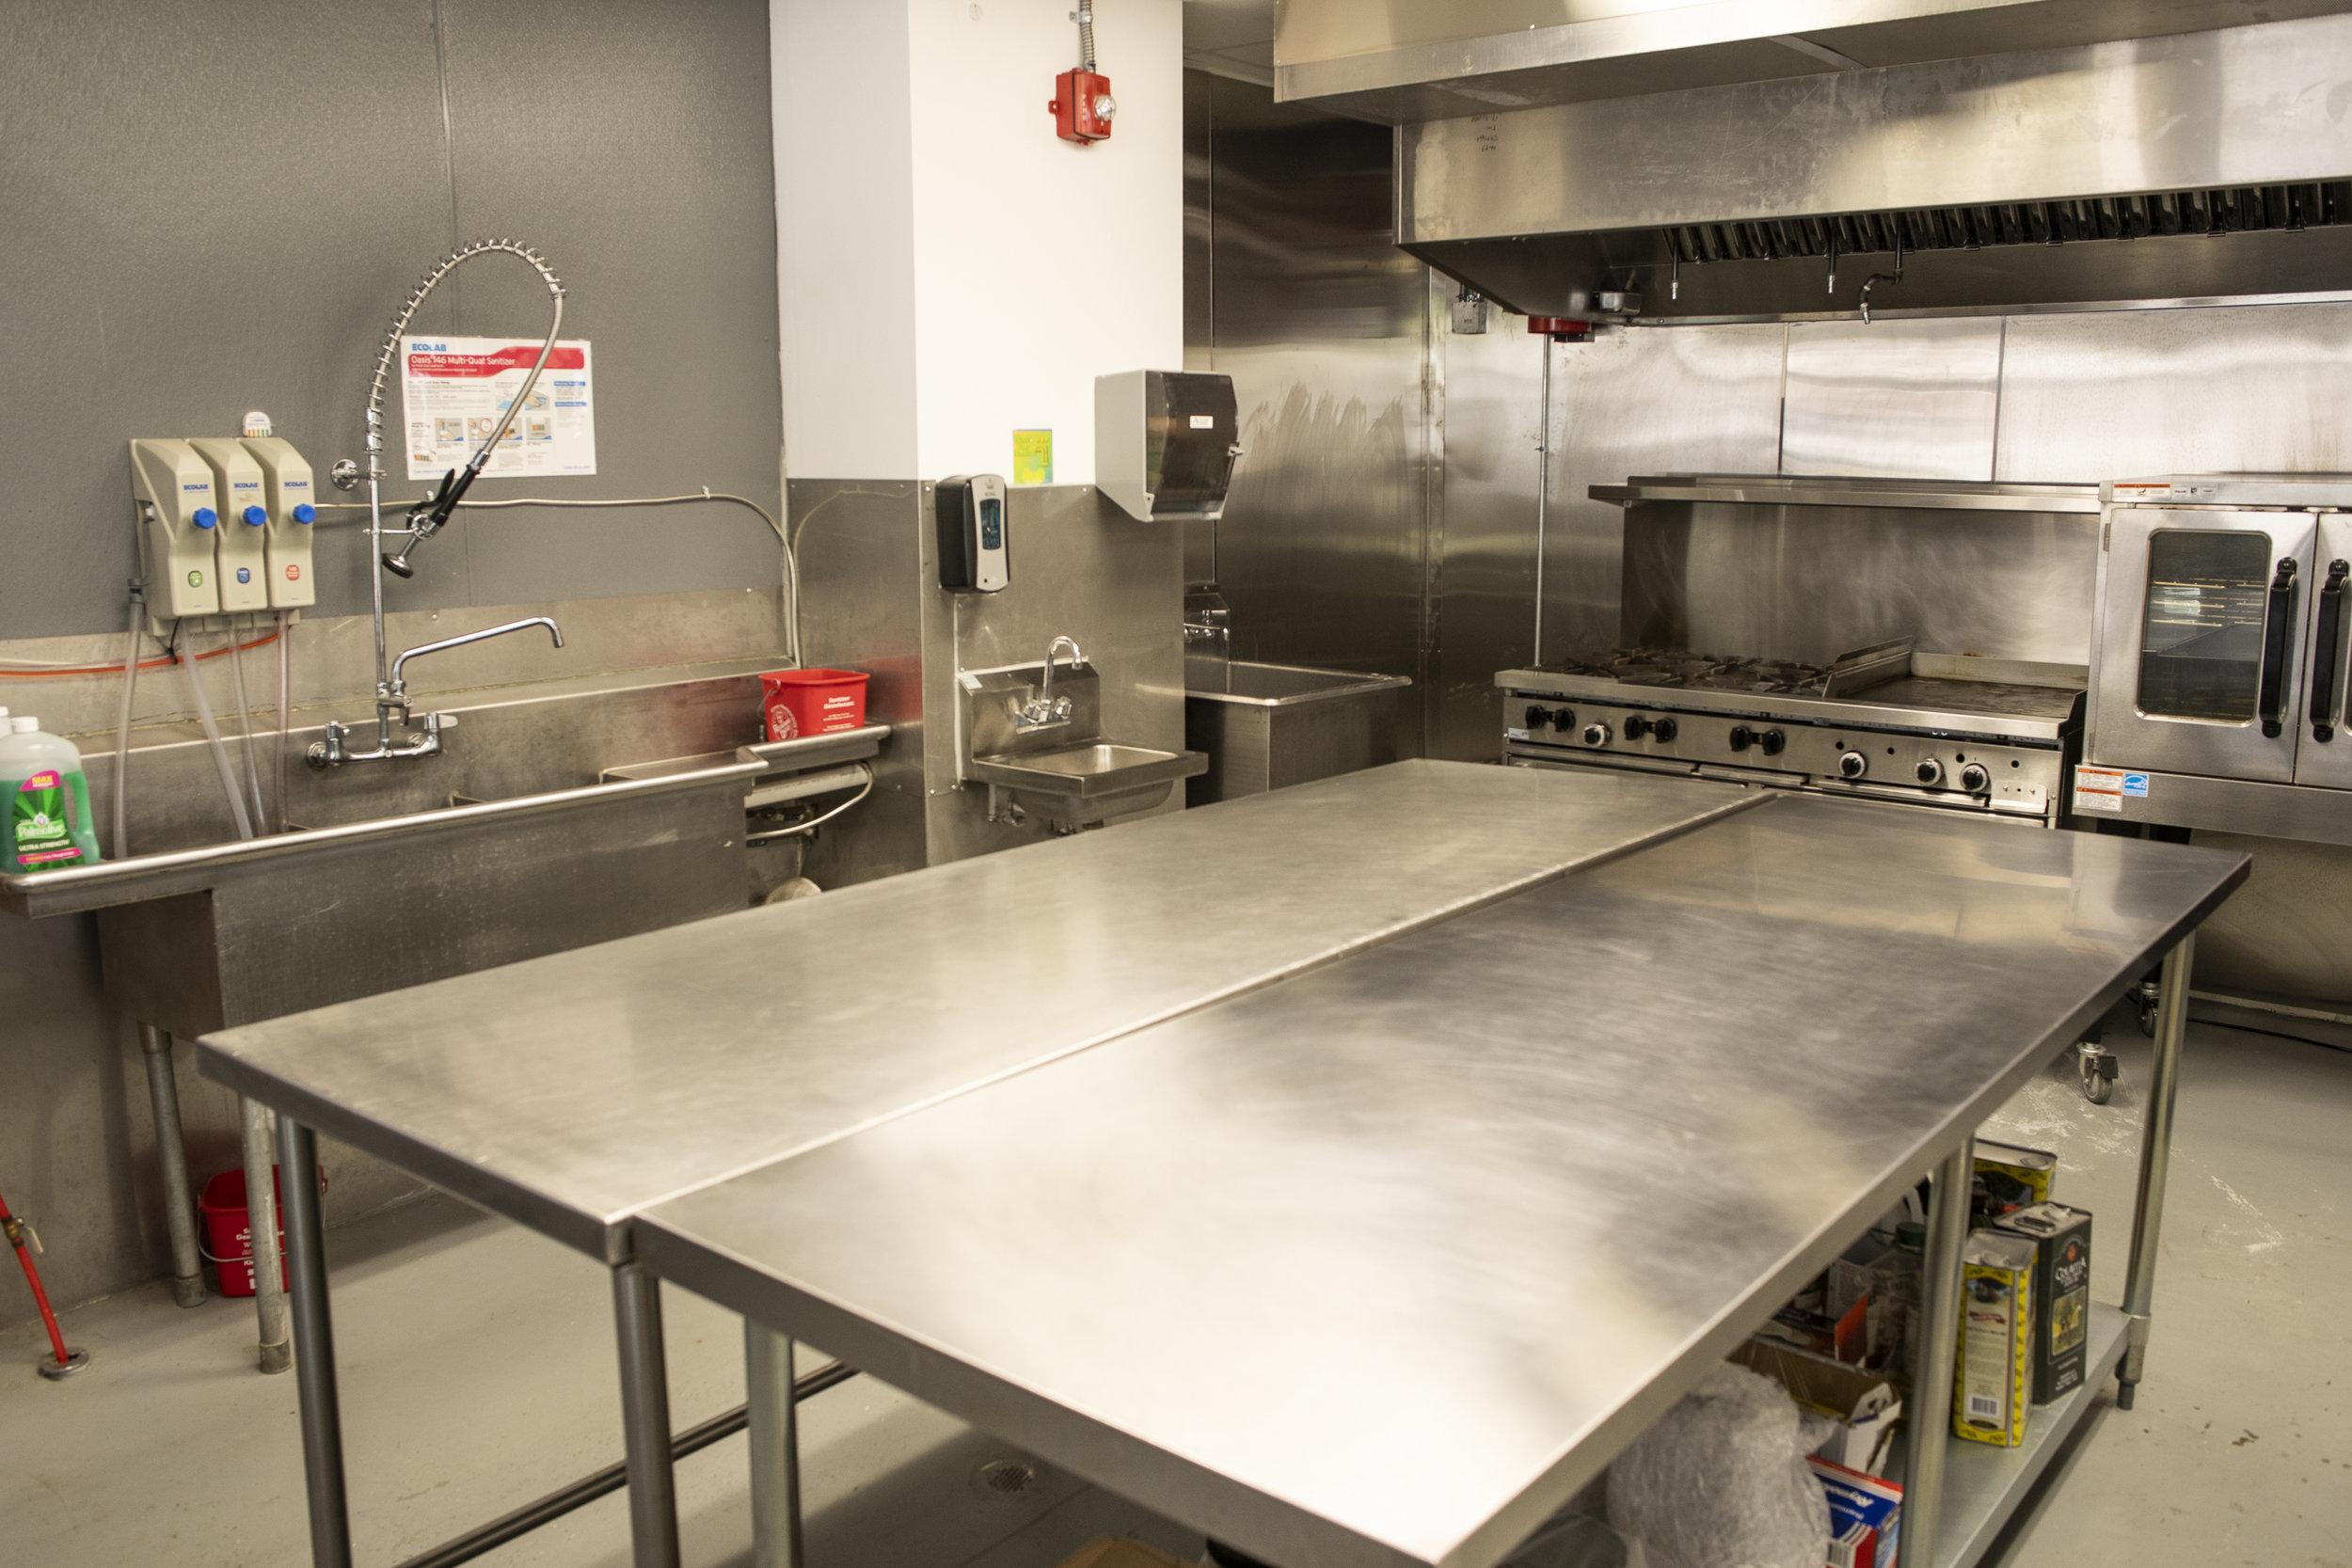 Commercial Kitchen-0146.jpg